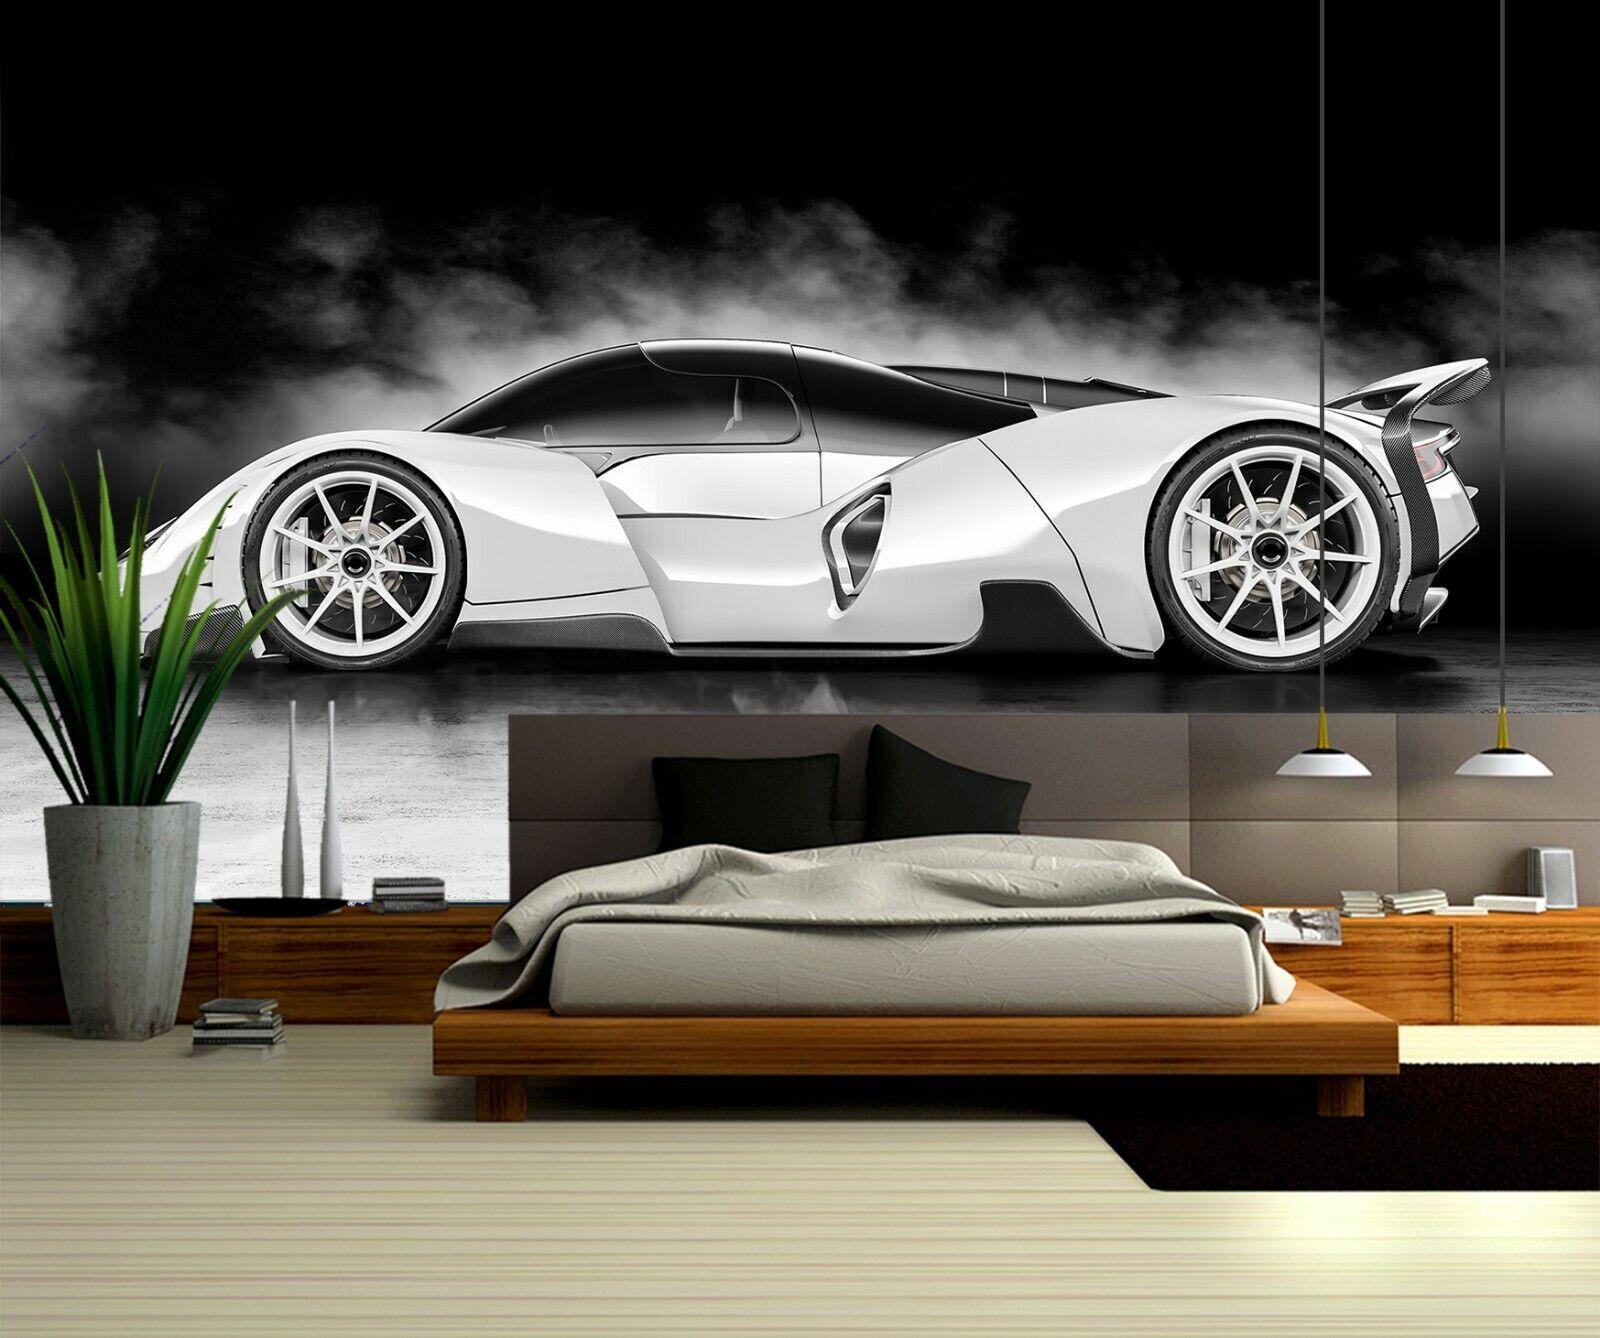 3D Weiß Sports Car B054 Car WandPapier Mural Sefl-adhesive Removable Wendy